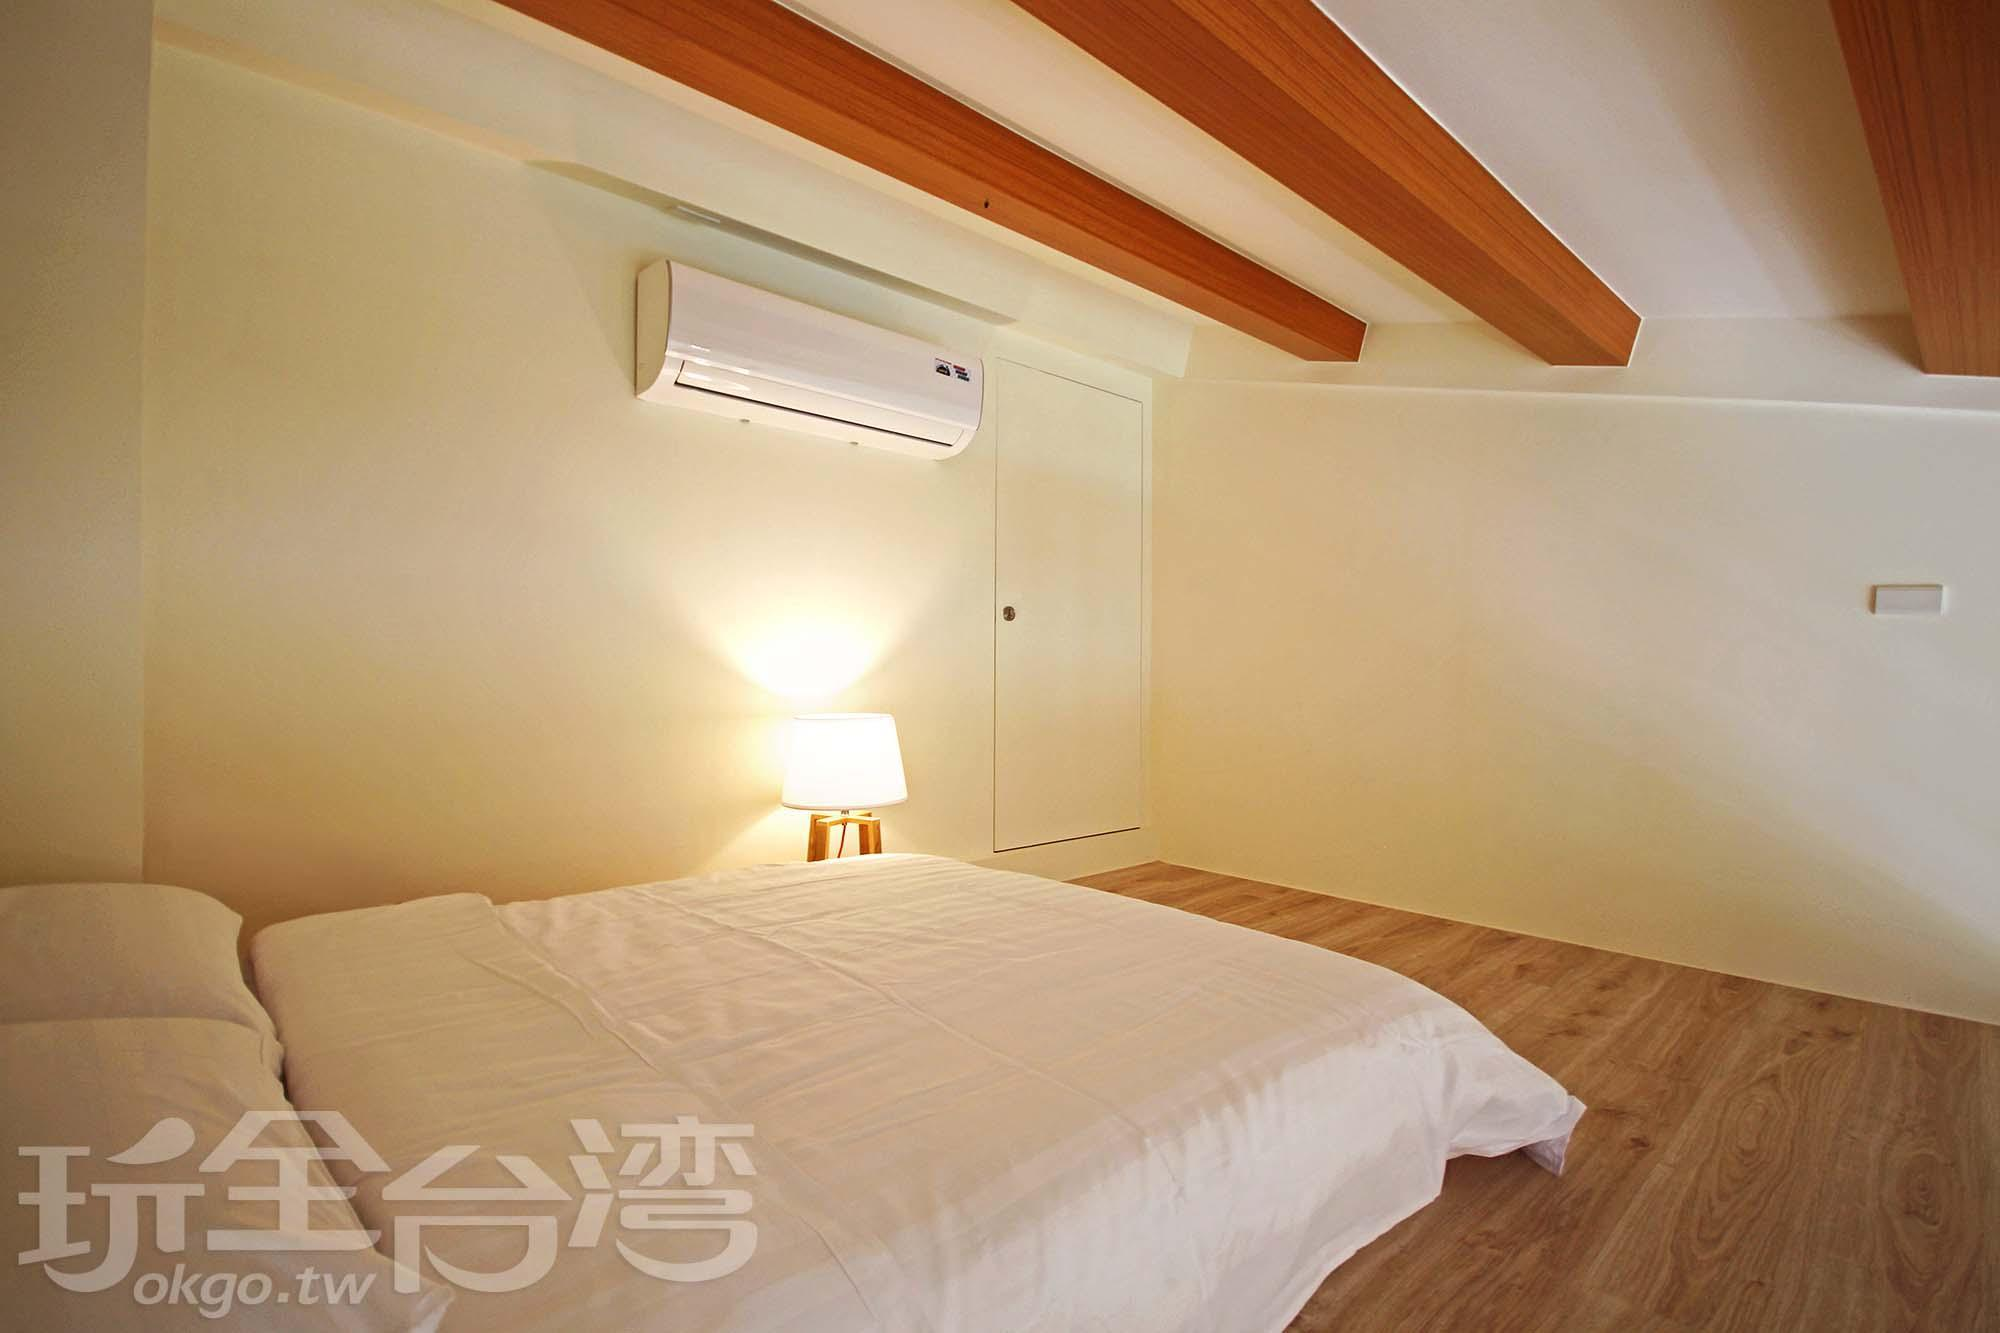 Songhe ShanShuei BandB Hotel 303